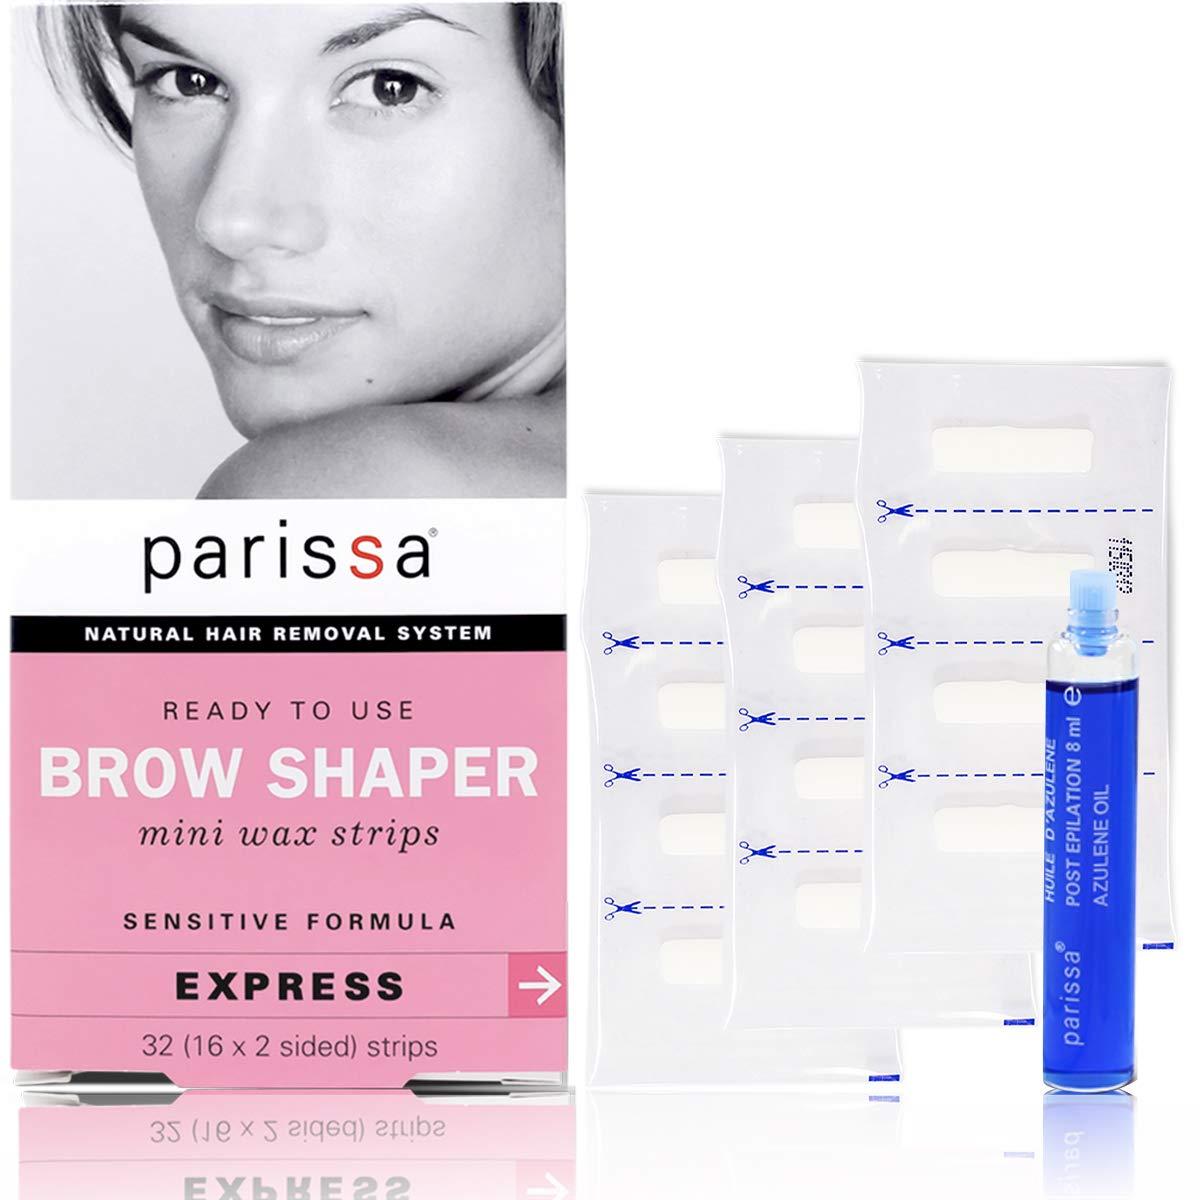 Parissa Eyebrow Shaper Wax Strip